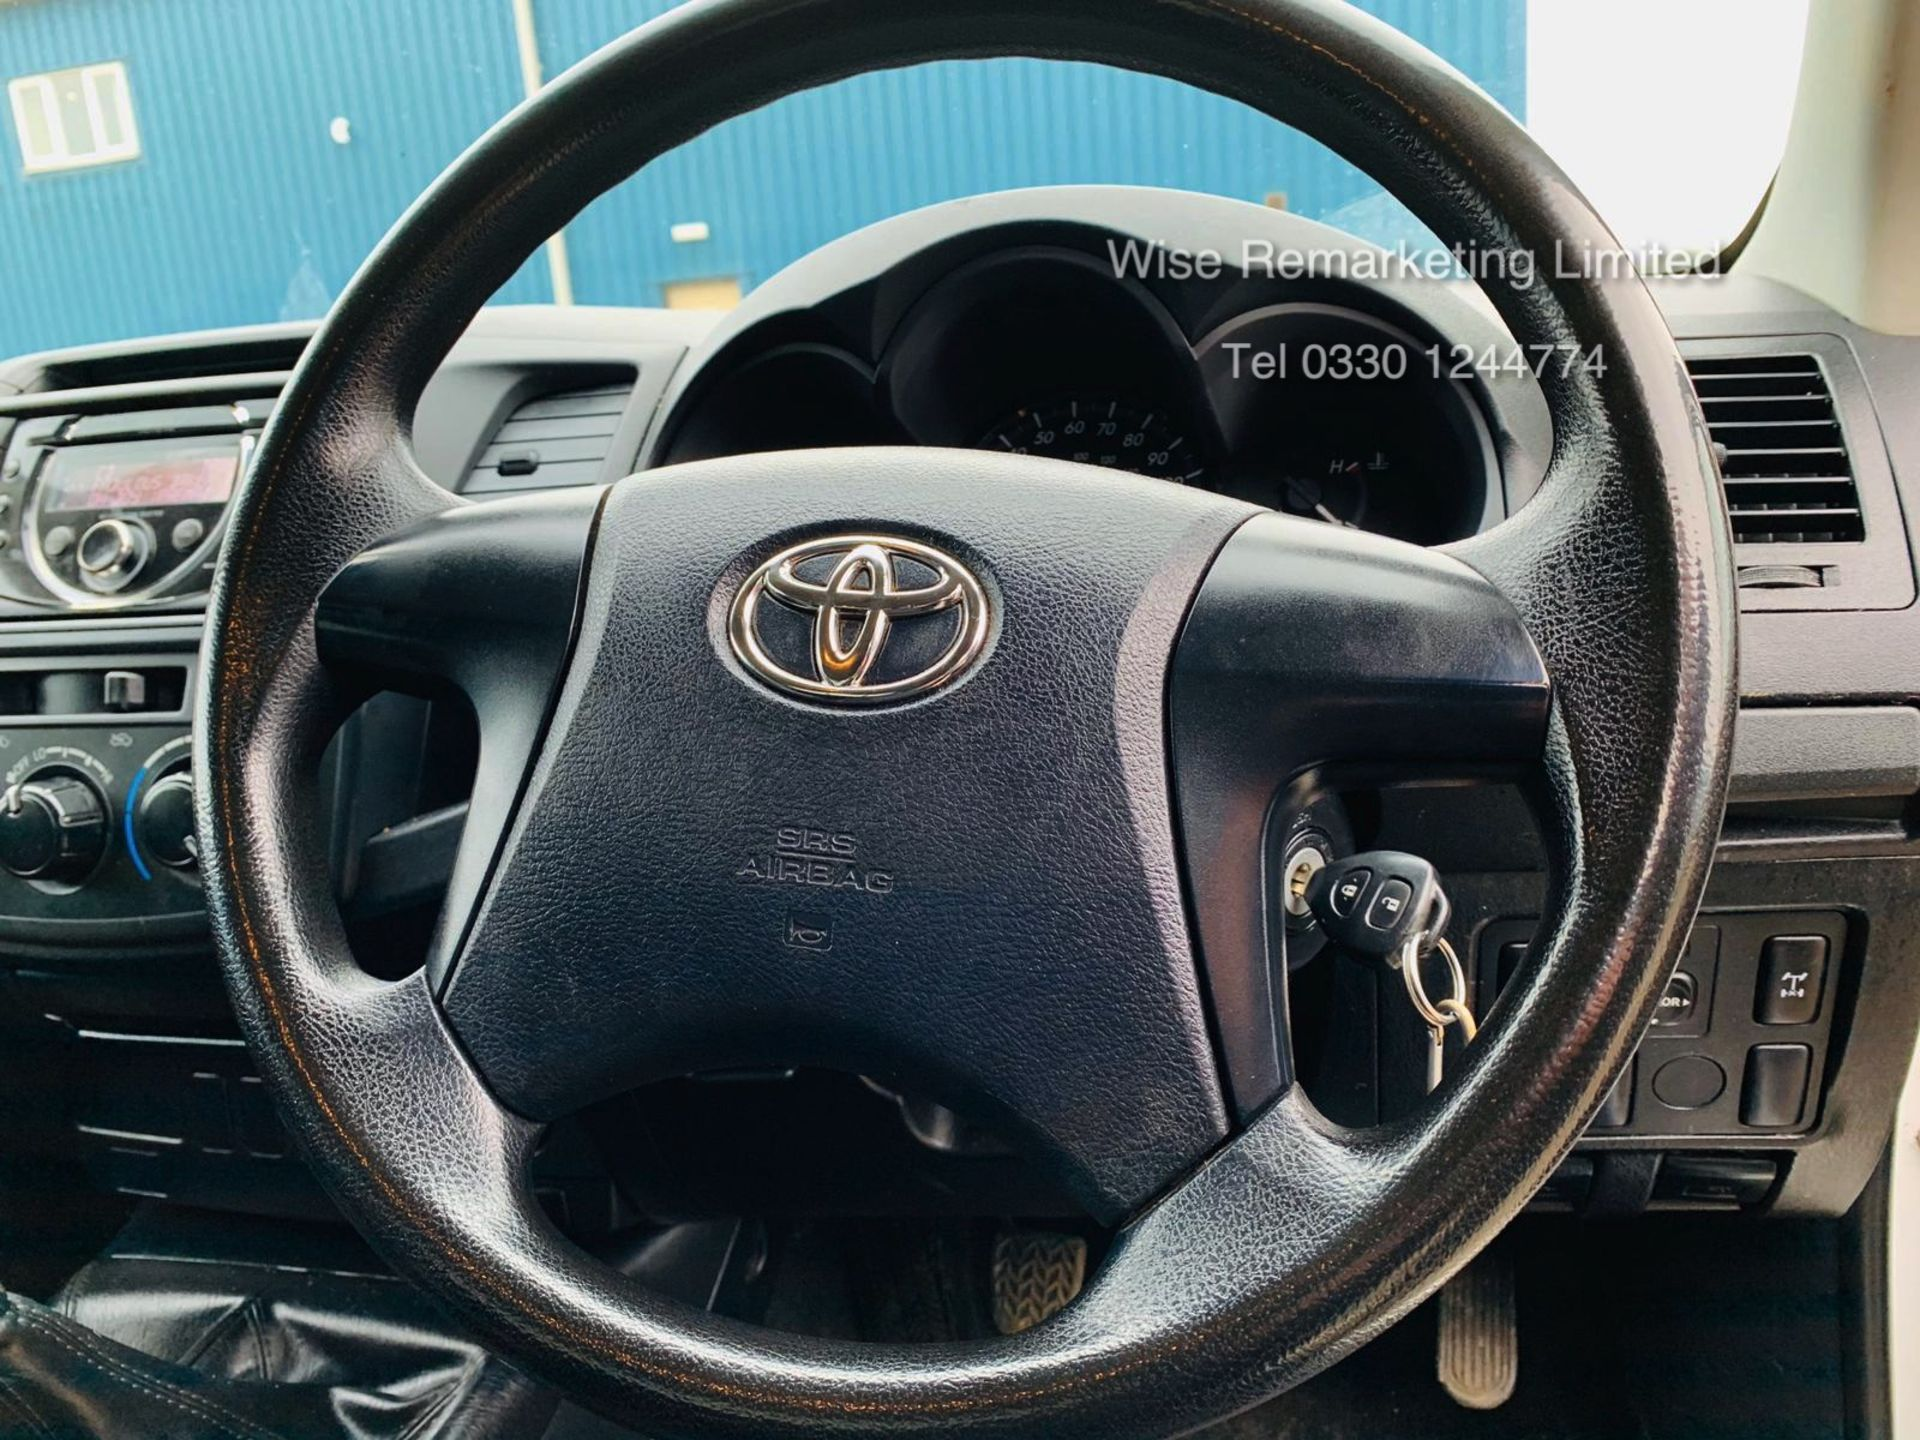 Lot 10a - Reserve Met Toyota Hilux Active 2.5 D-4D 4X4 - 2014 14 Reg - Air Con - Tow Pack - SAVE 20% NO VAT